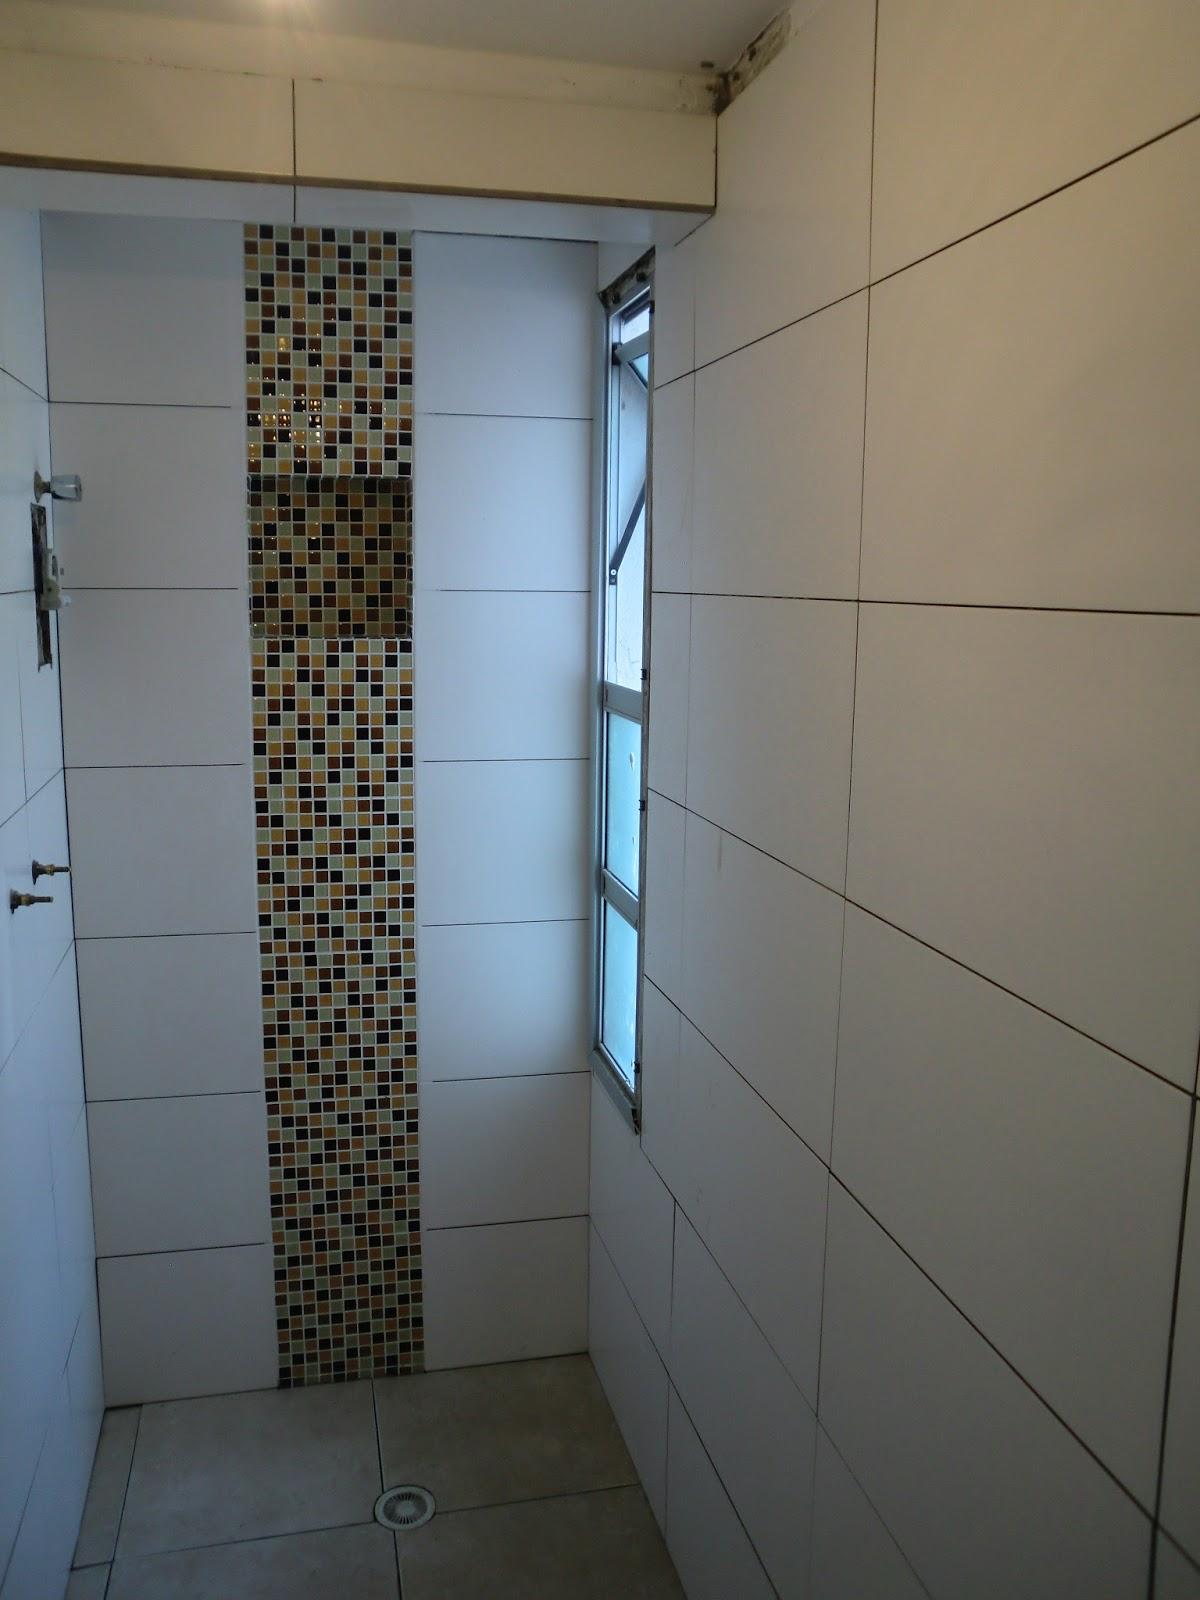 dos azulejos na parte de cima e deixado propositalmente para a moldura #0984C2 1200 1600